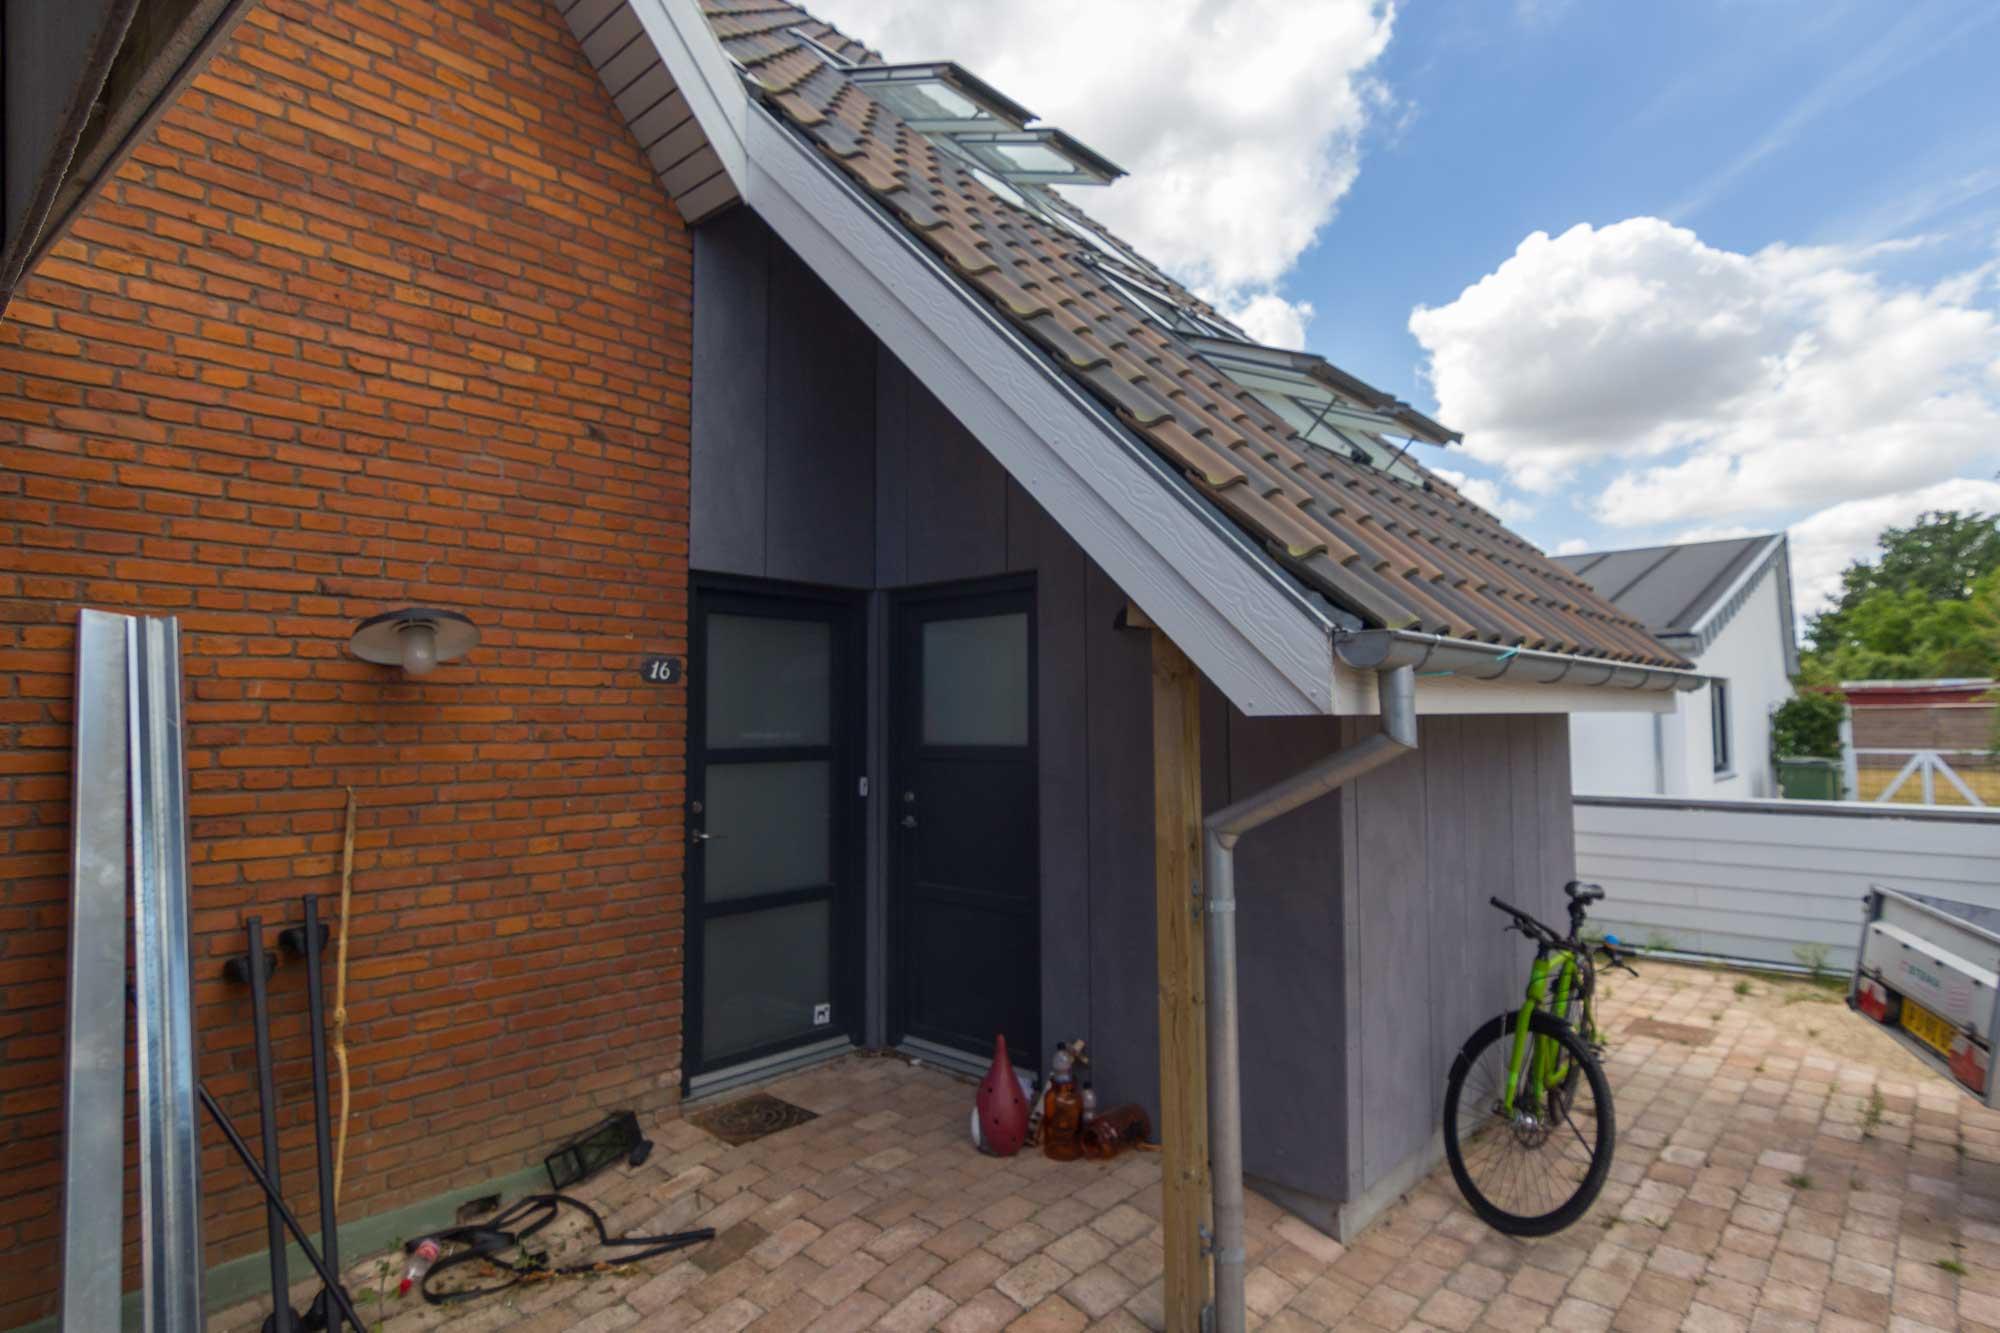 Rugvang_16_Odense_SV-5